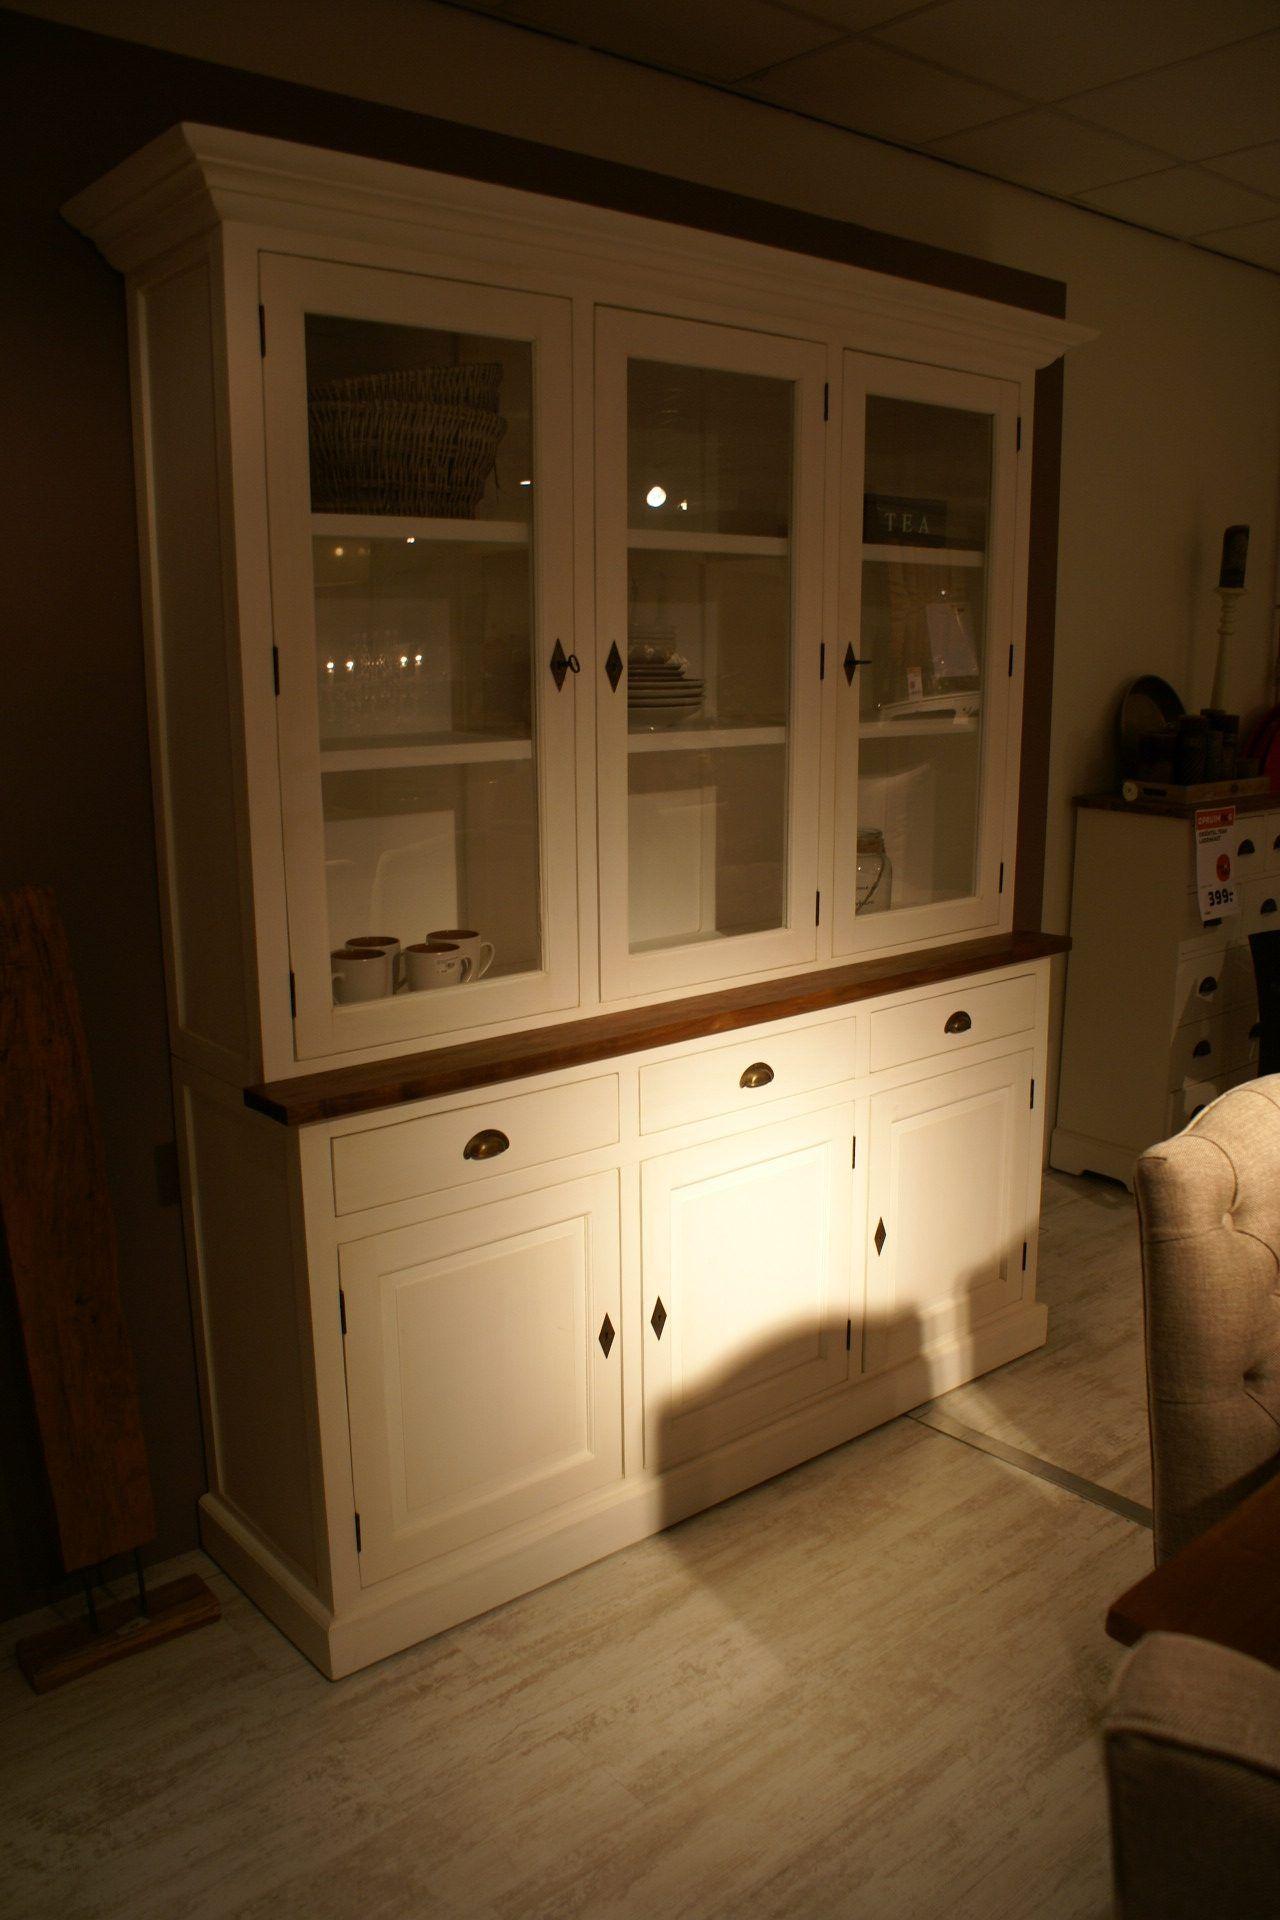 bergkast cape cod showroommodellen badkamers keukens slapen